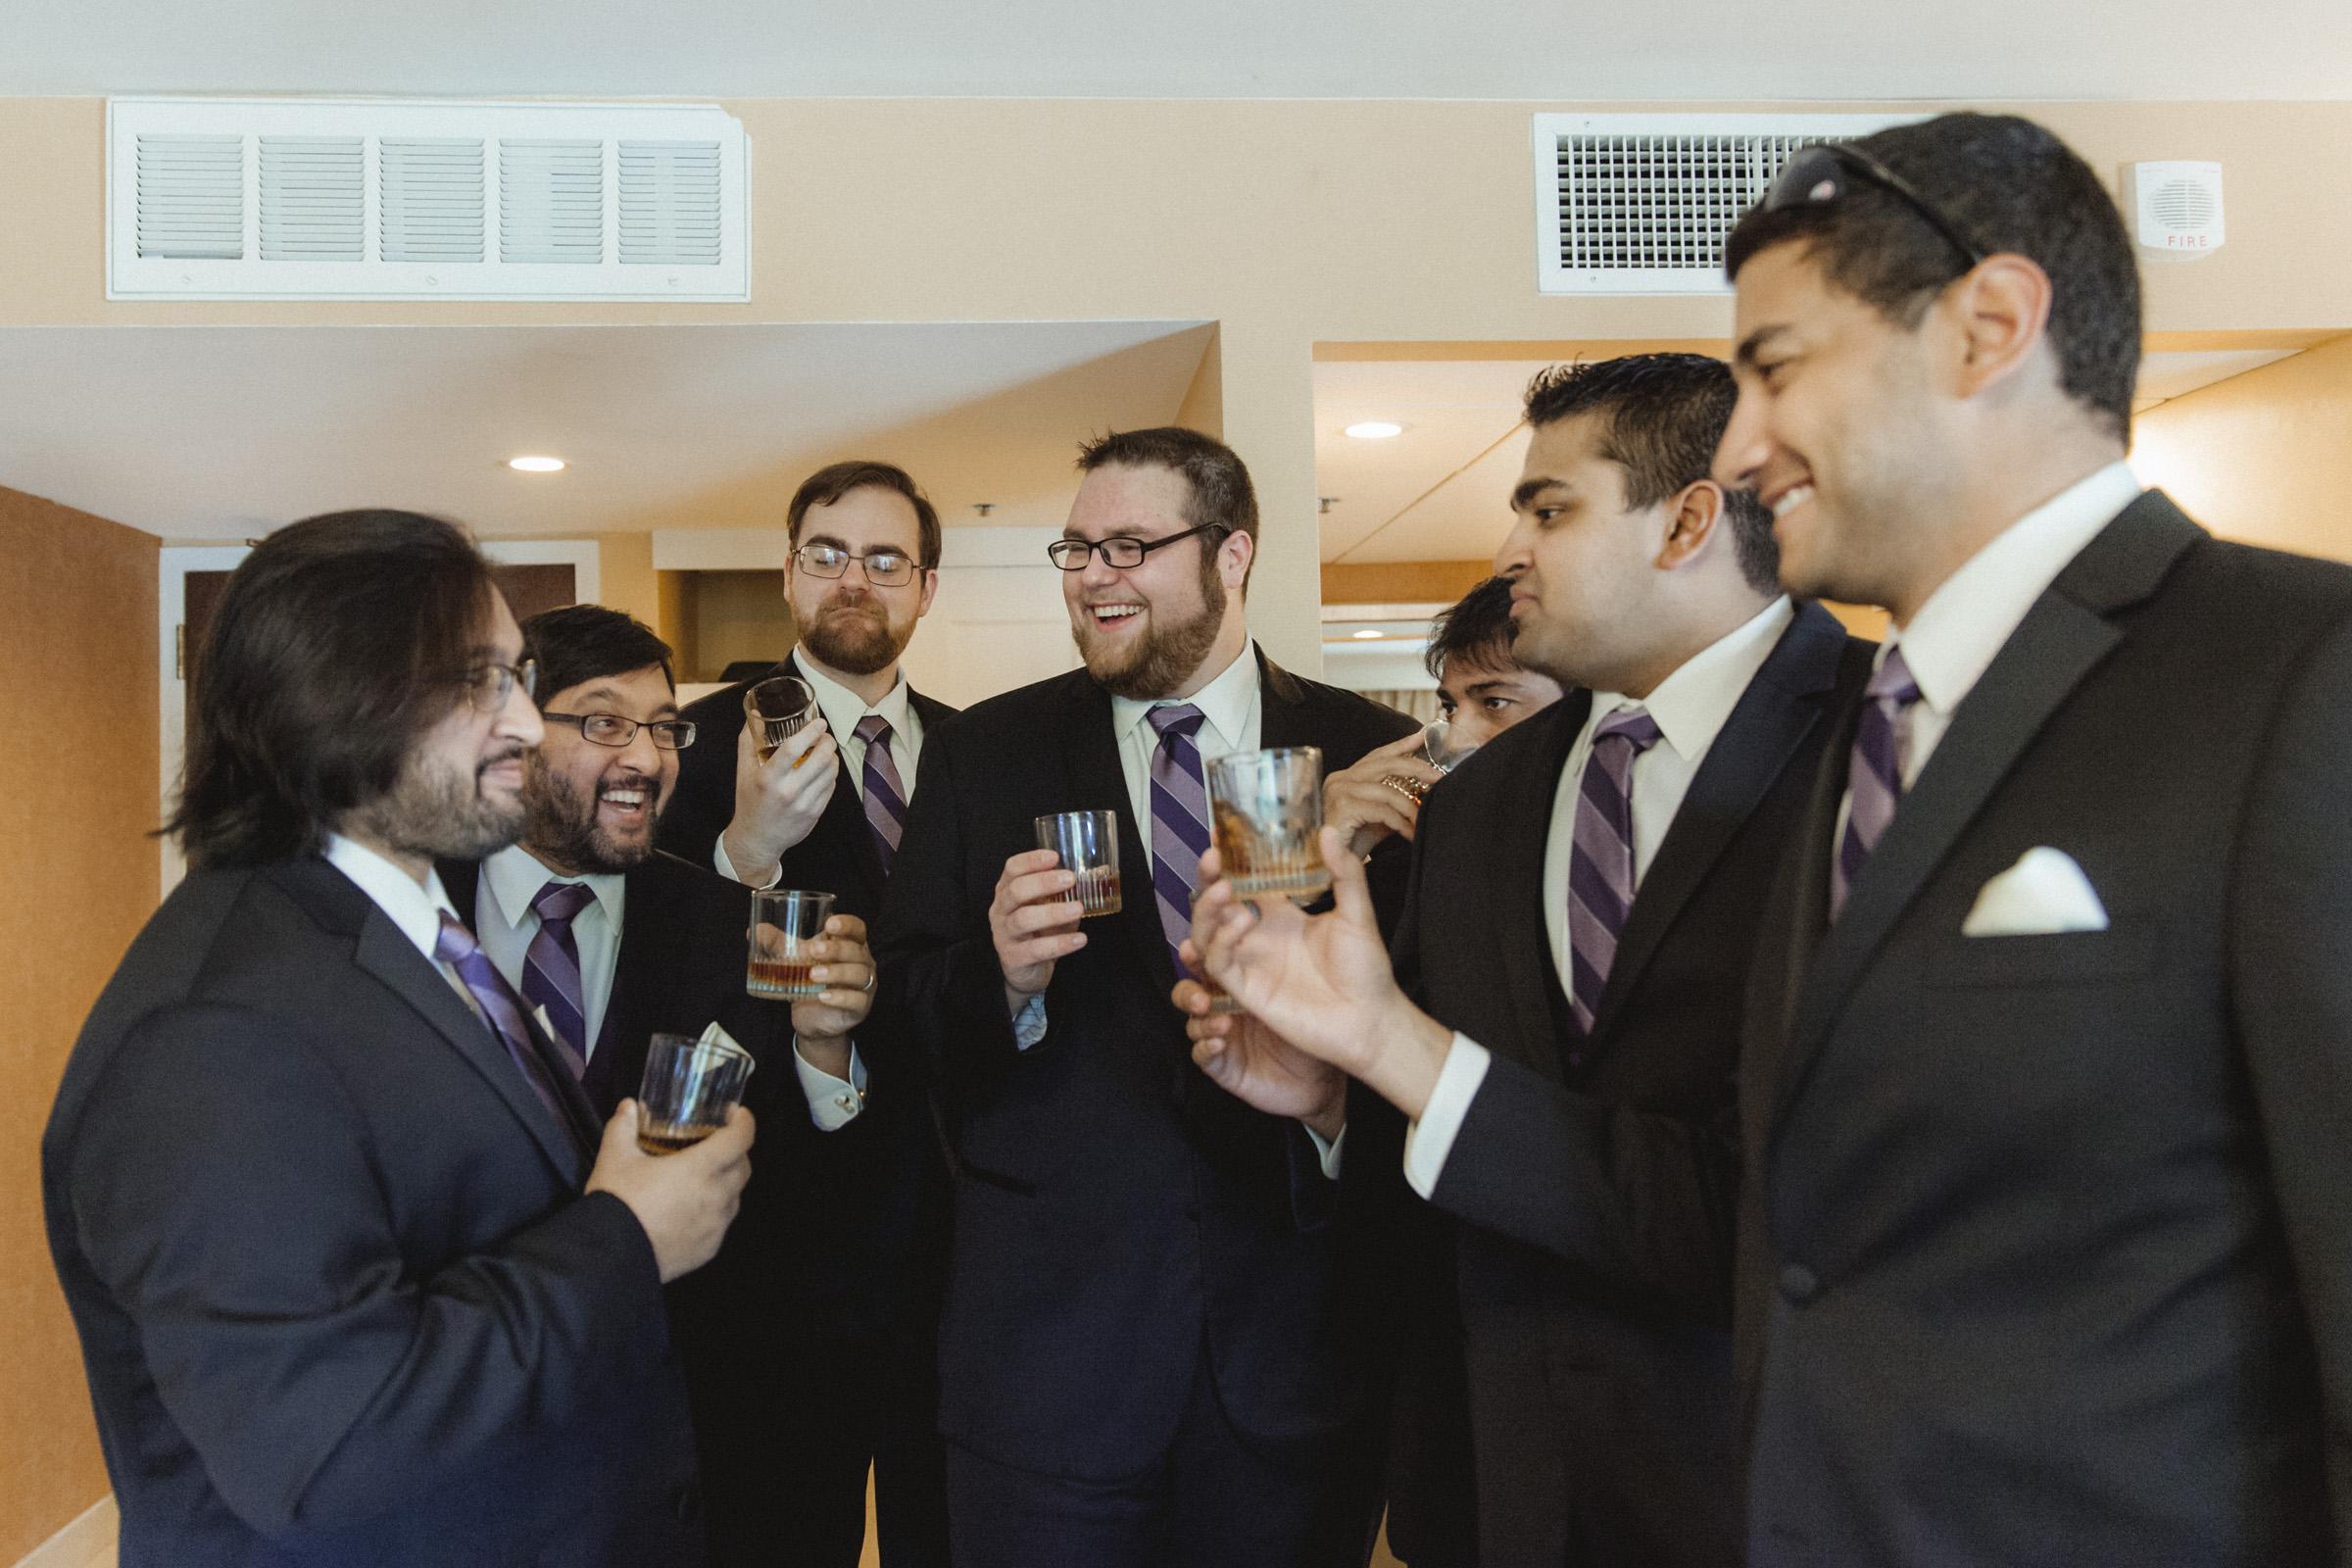 Groomsmen toast to the groom - Estate at Florentine Gardens wedding - Hudson Valley Wedding - Kelsey & Anish's wedding - Amy Sims Photography